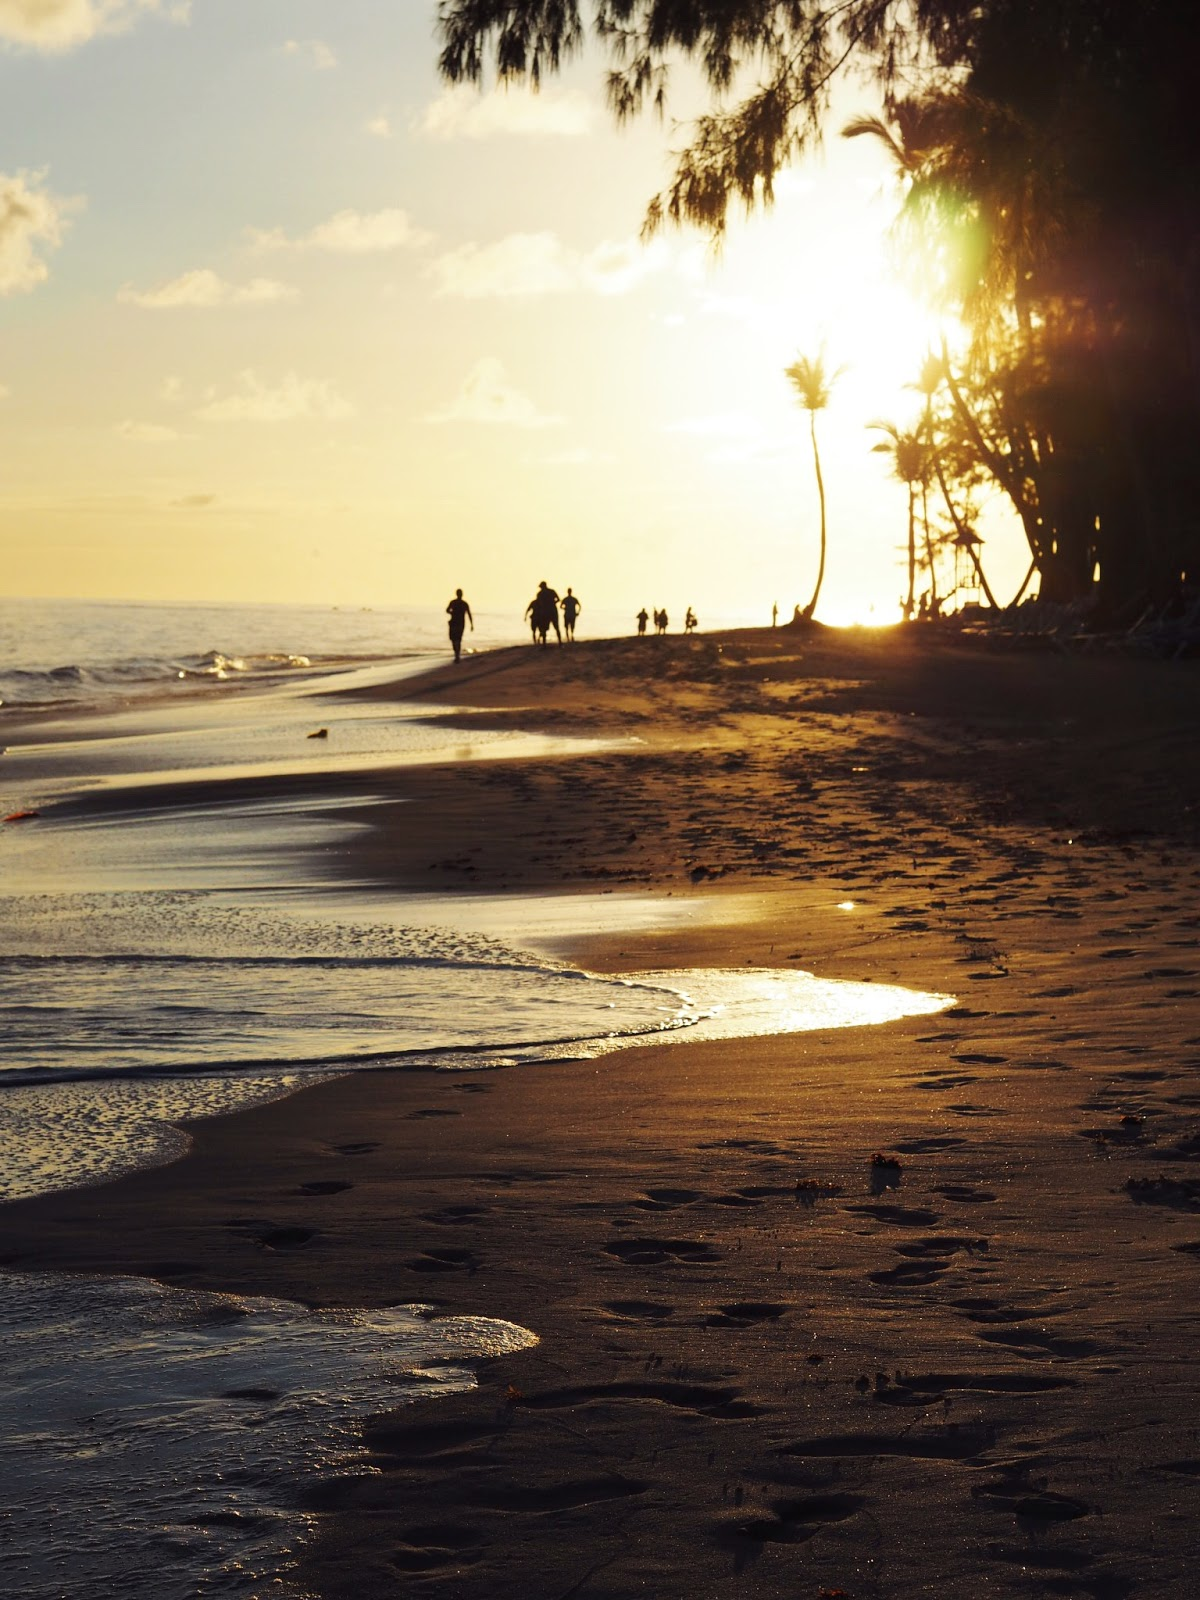 Bavaro Beach Punta Cana at SunRise reflection on water